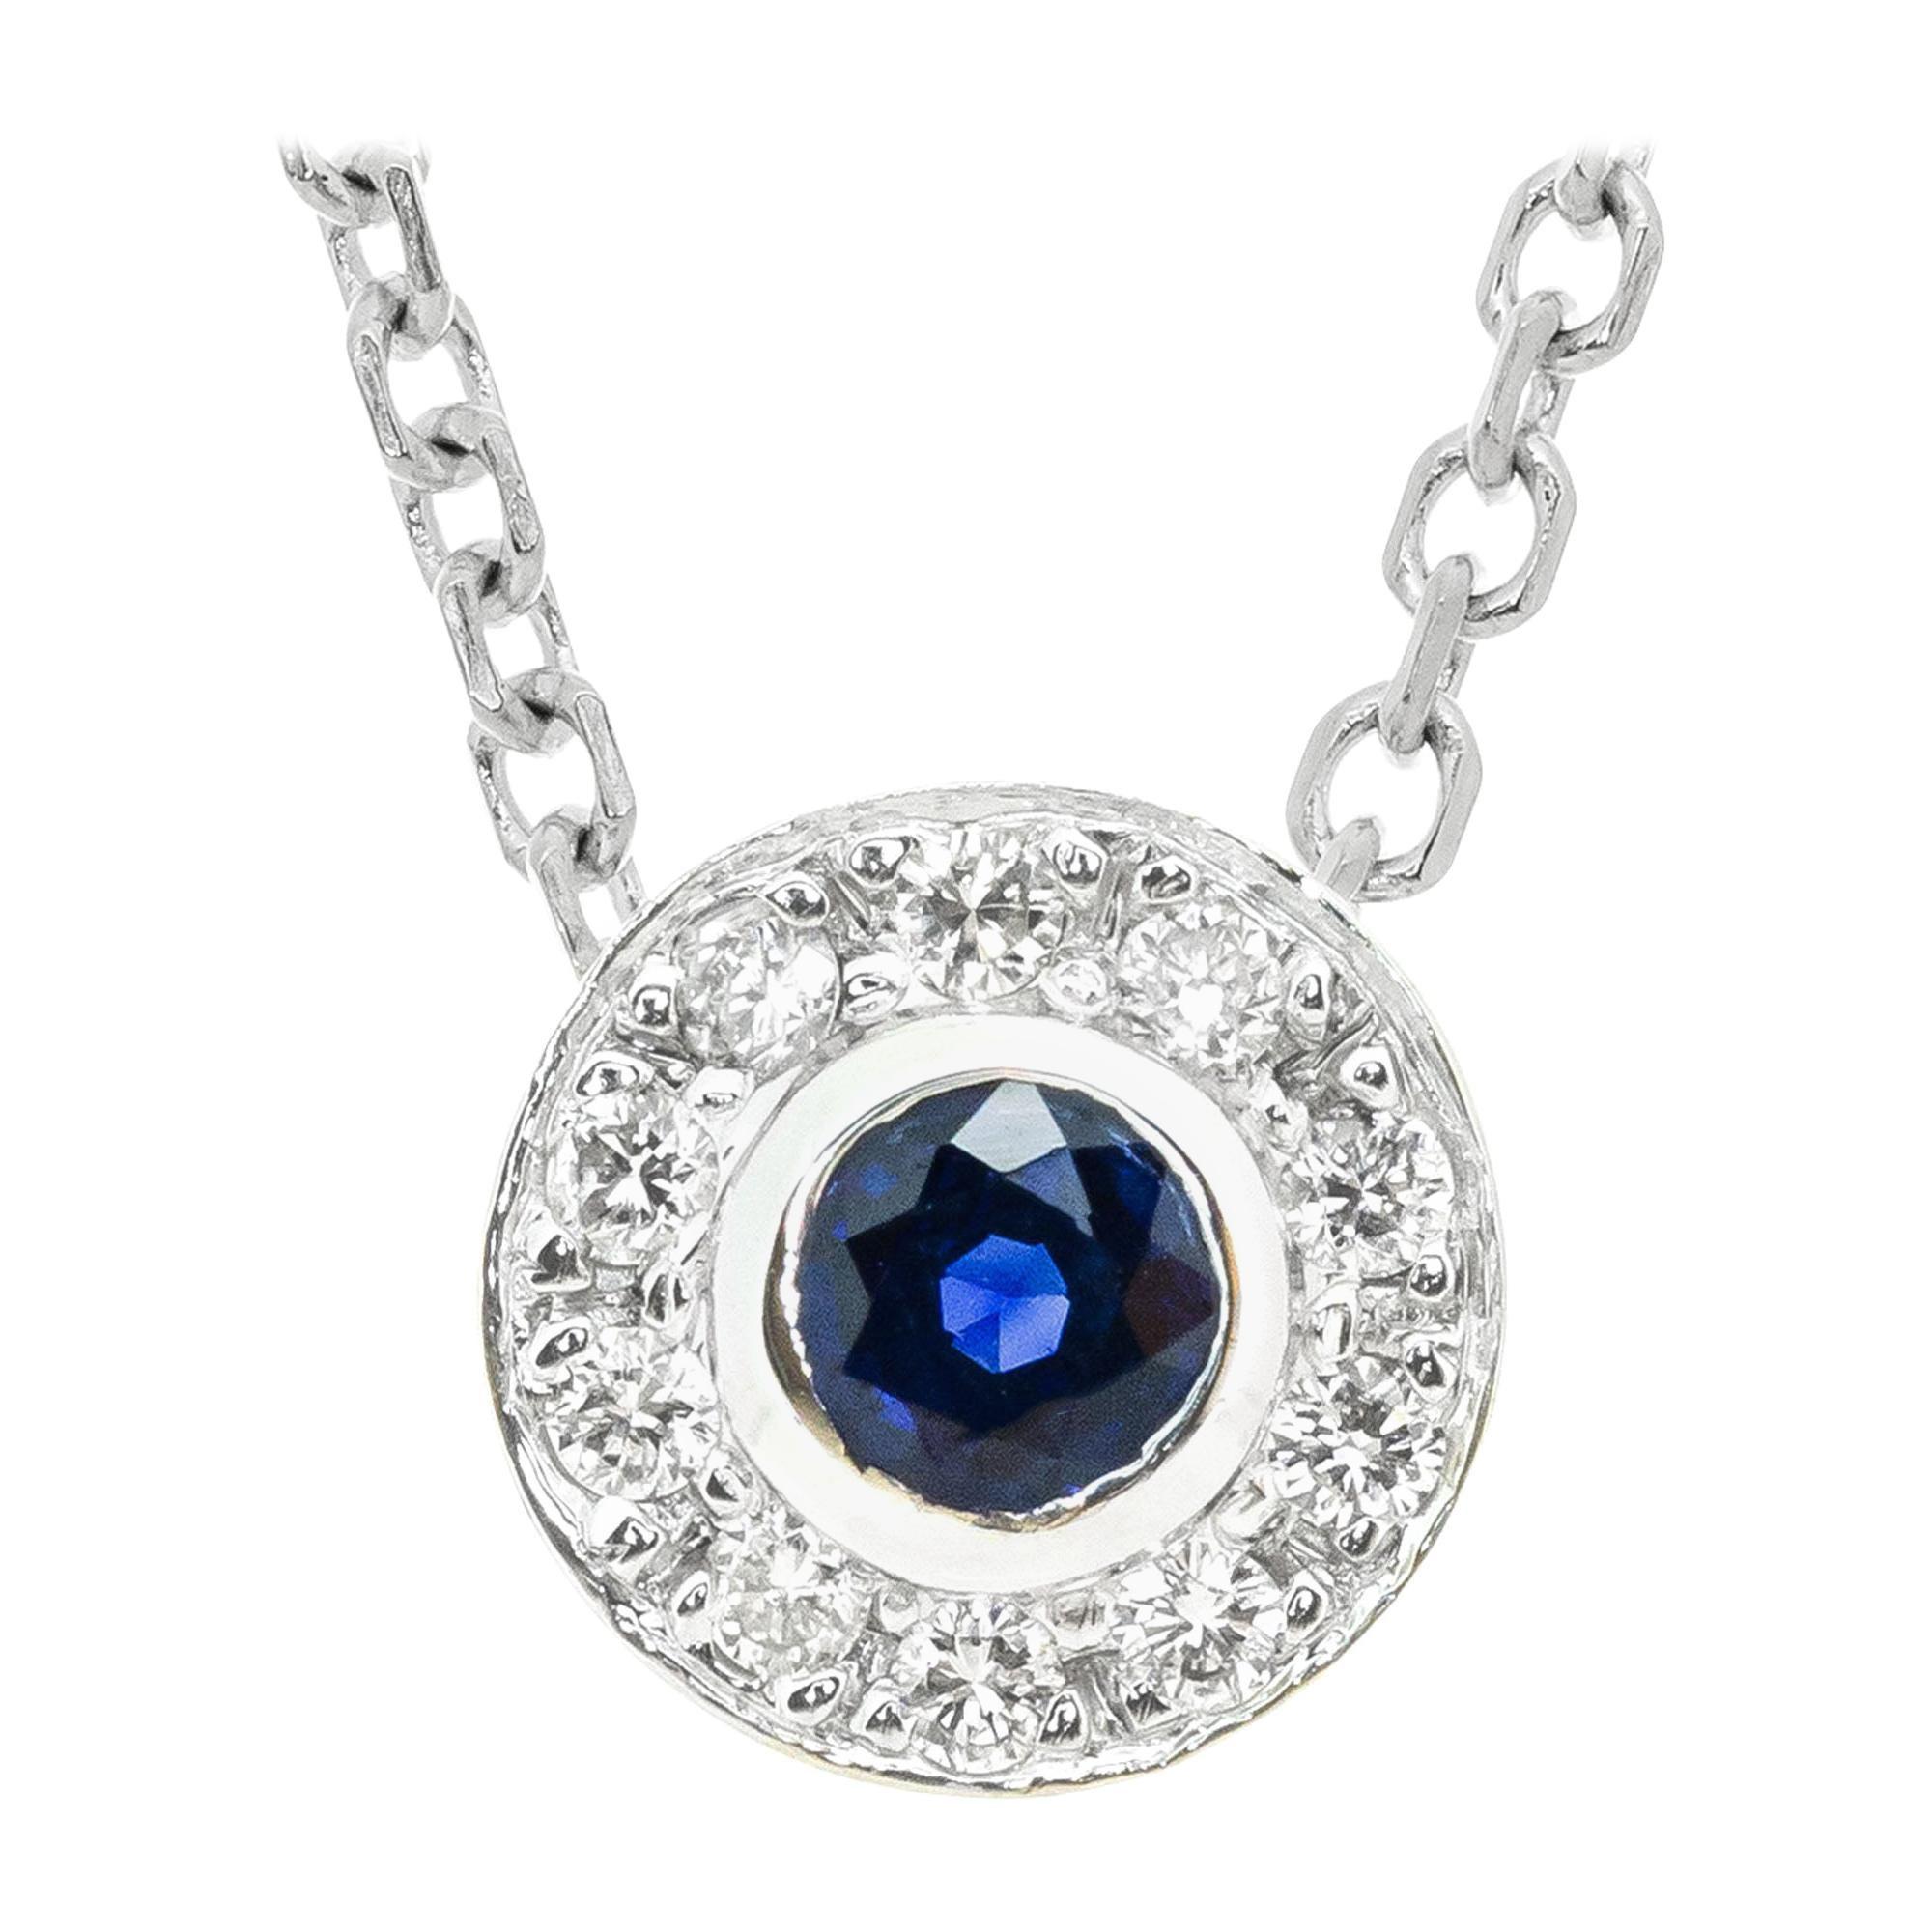 .25 Carat Blue Sapphire Diamond White Gold Halo Pendant Necklace